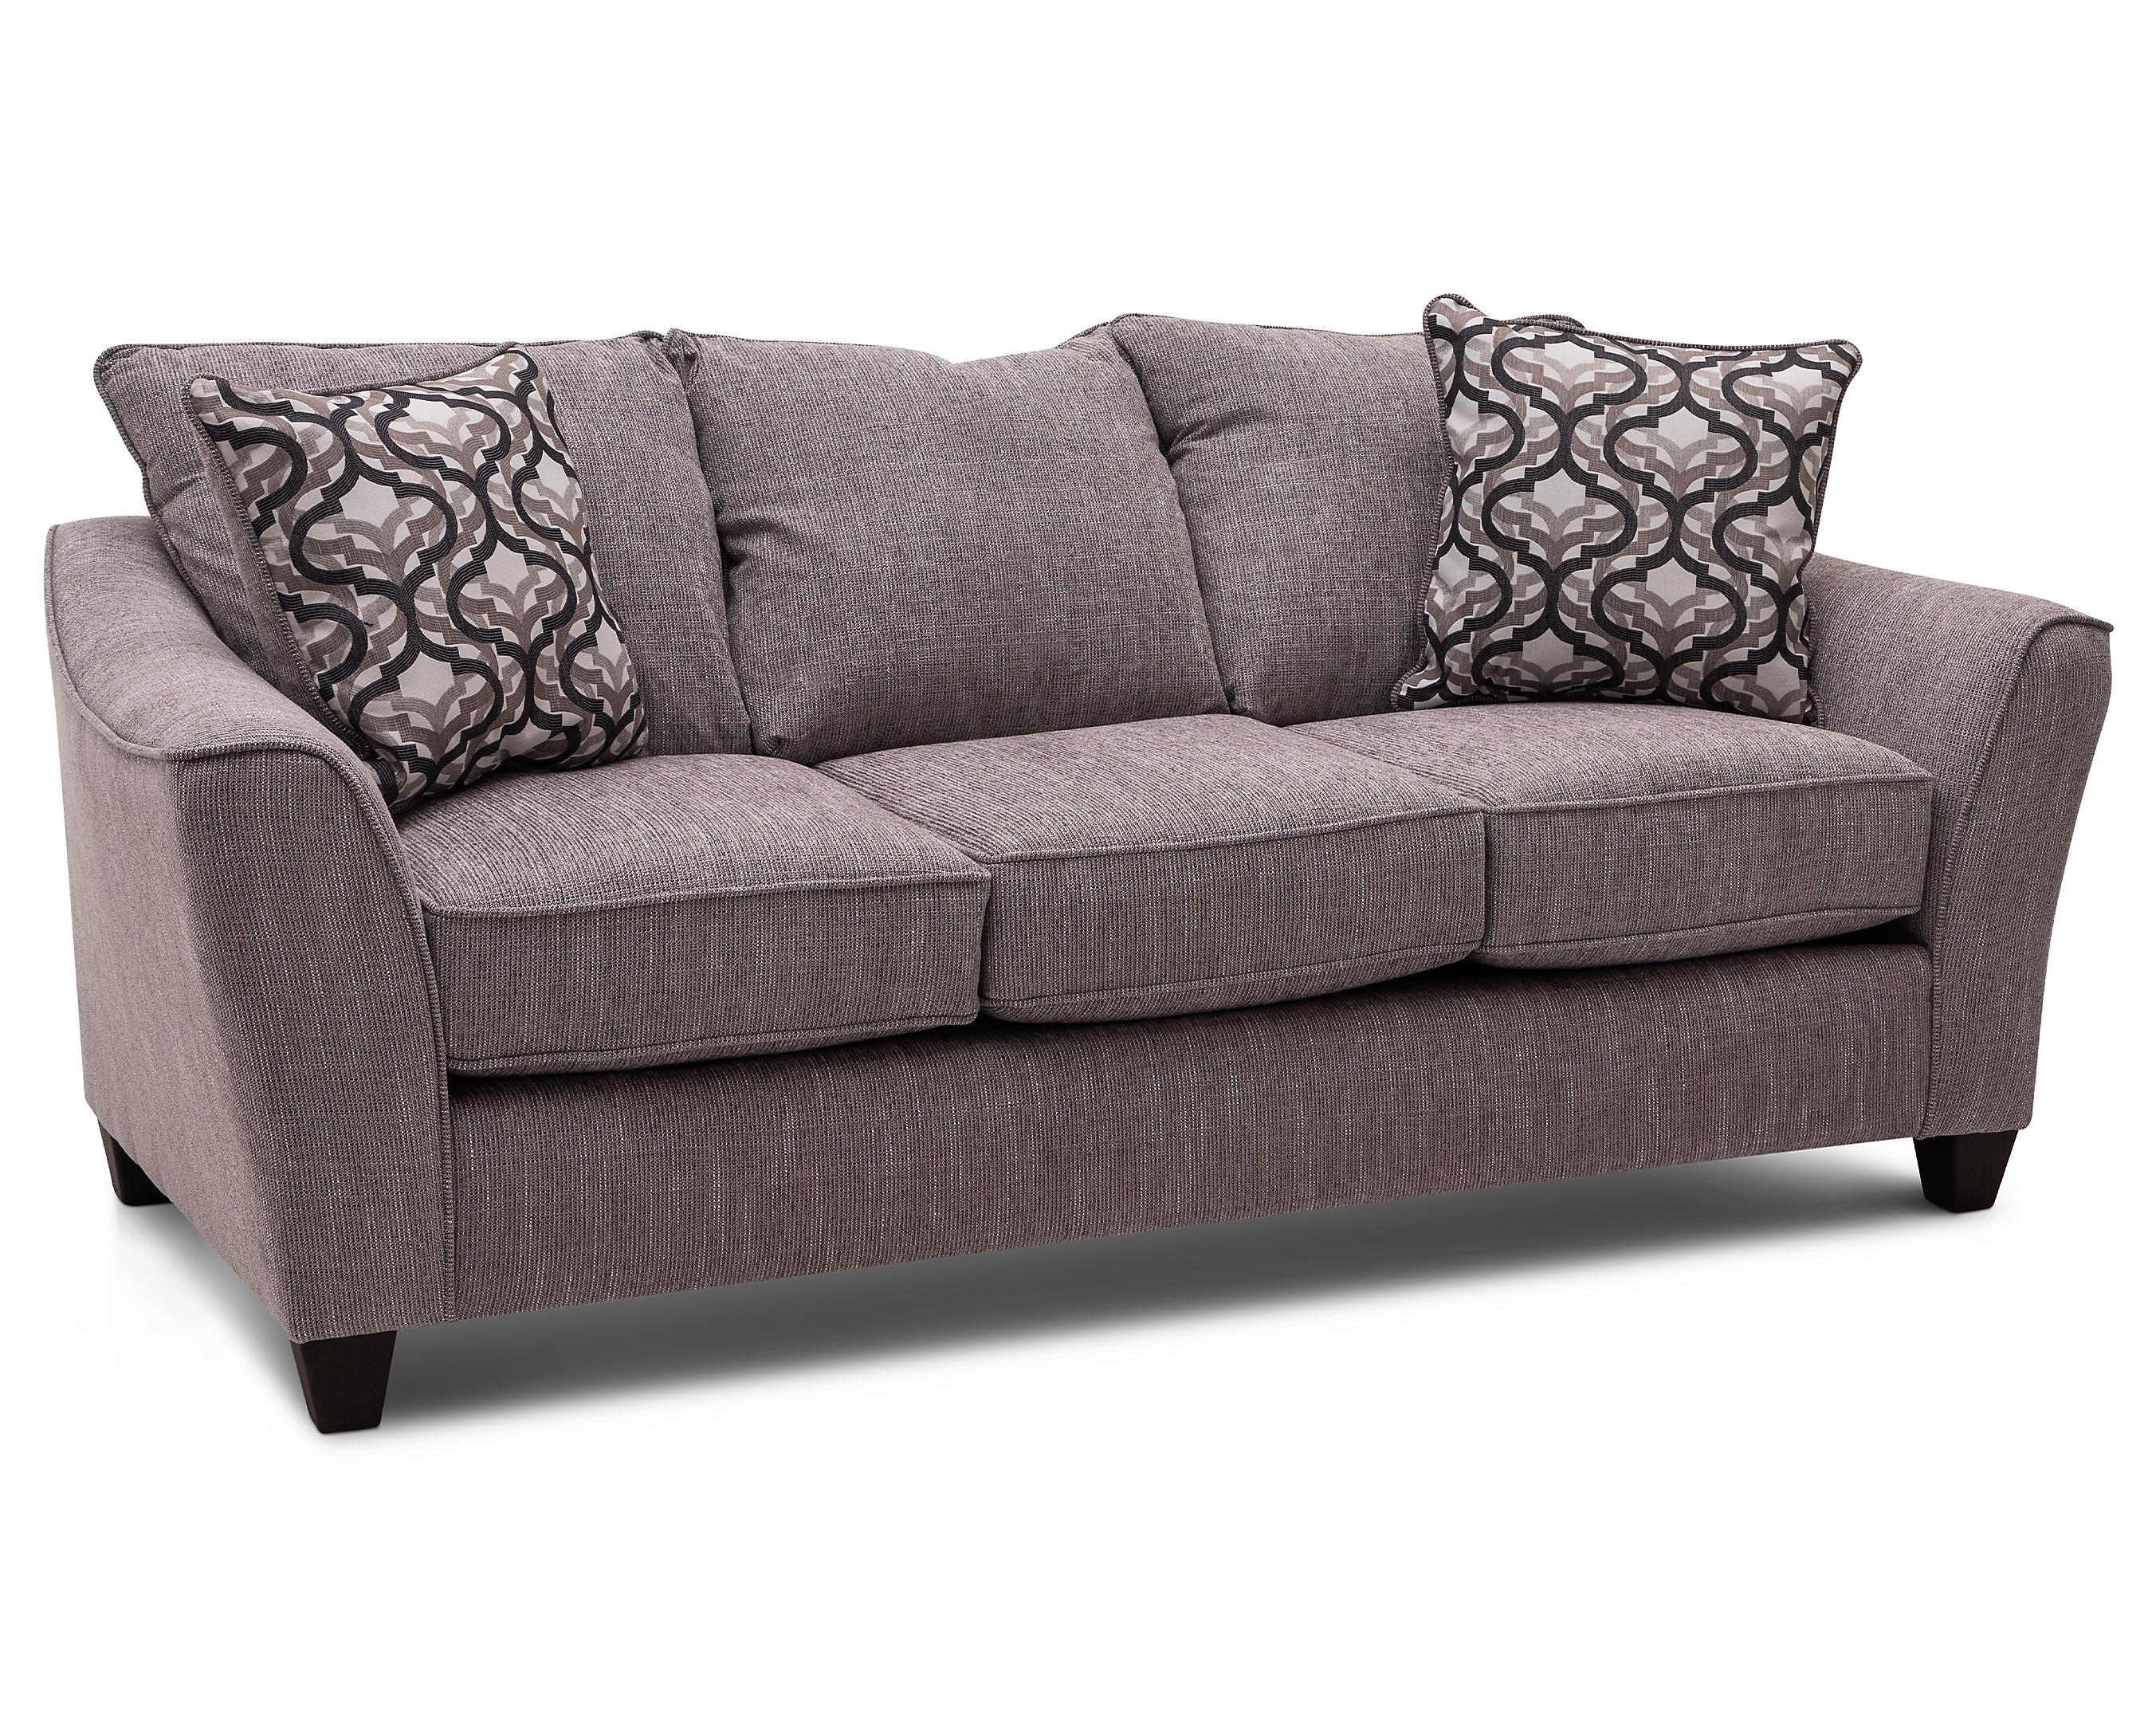 Mainstay Sofa Furniture Row